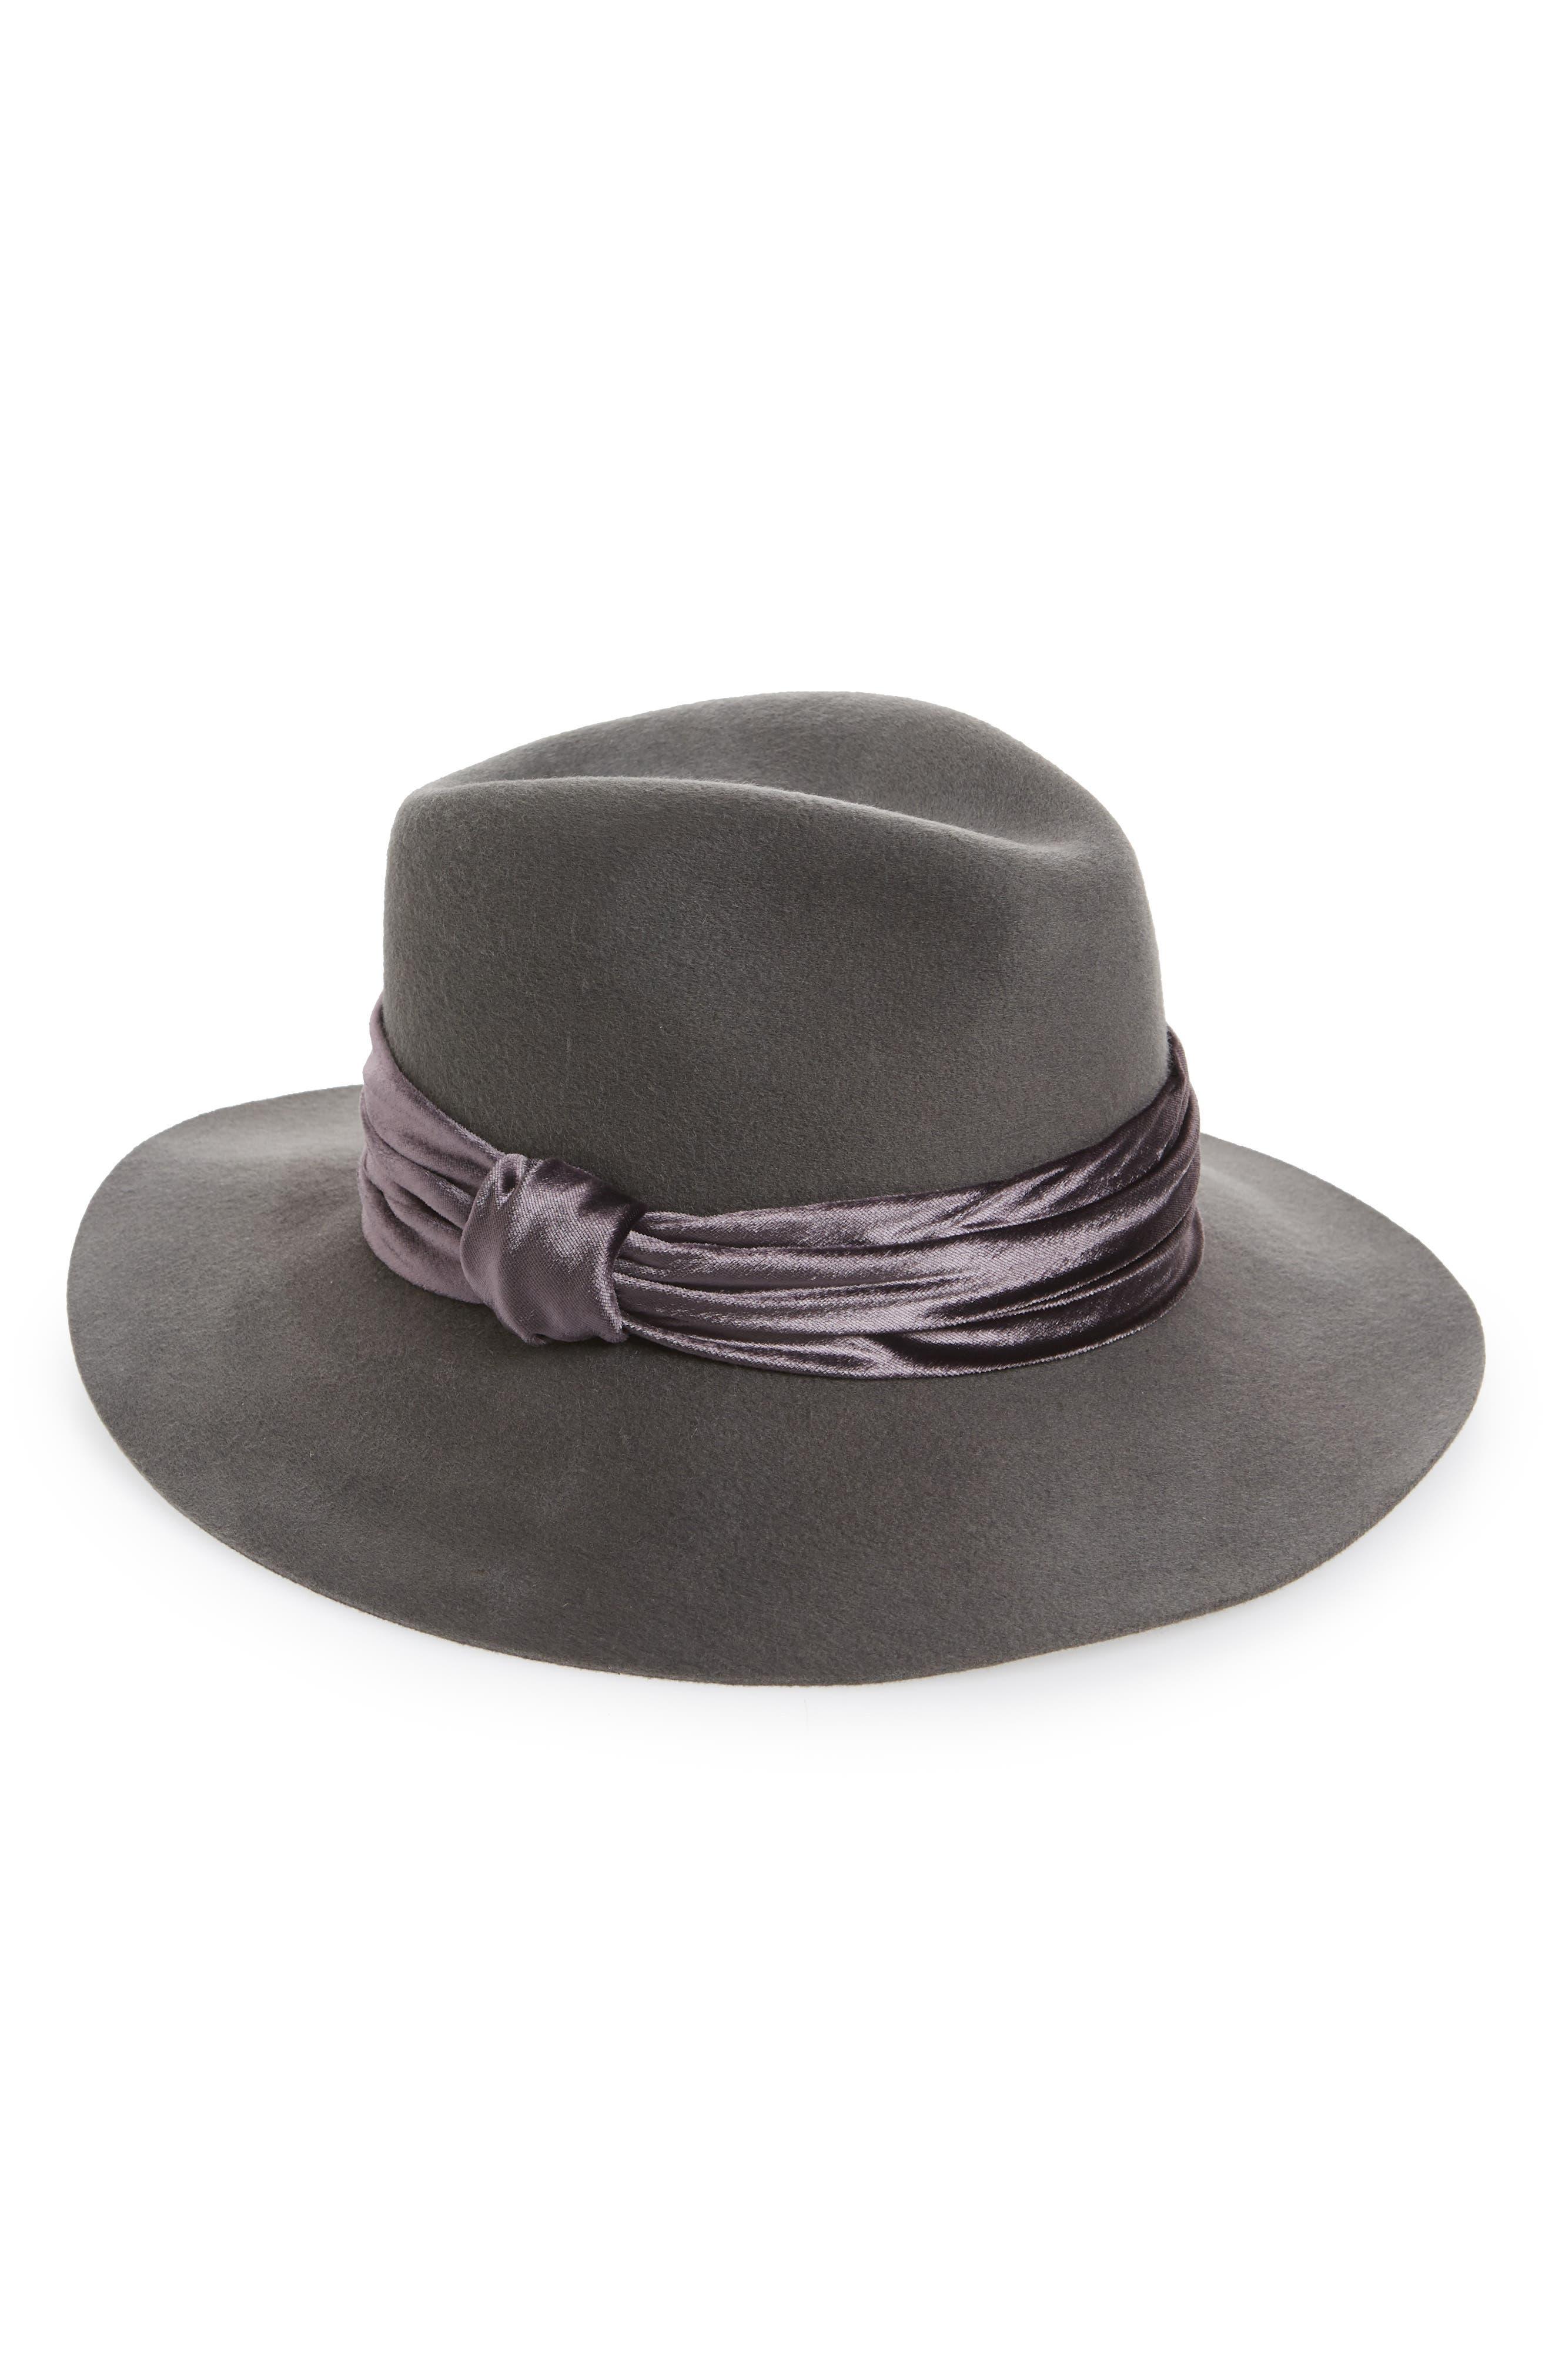 af4d29a9b95d0 New Markdowns Women s Hats